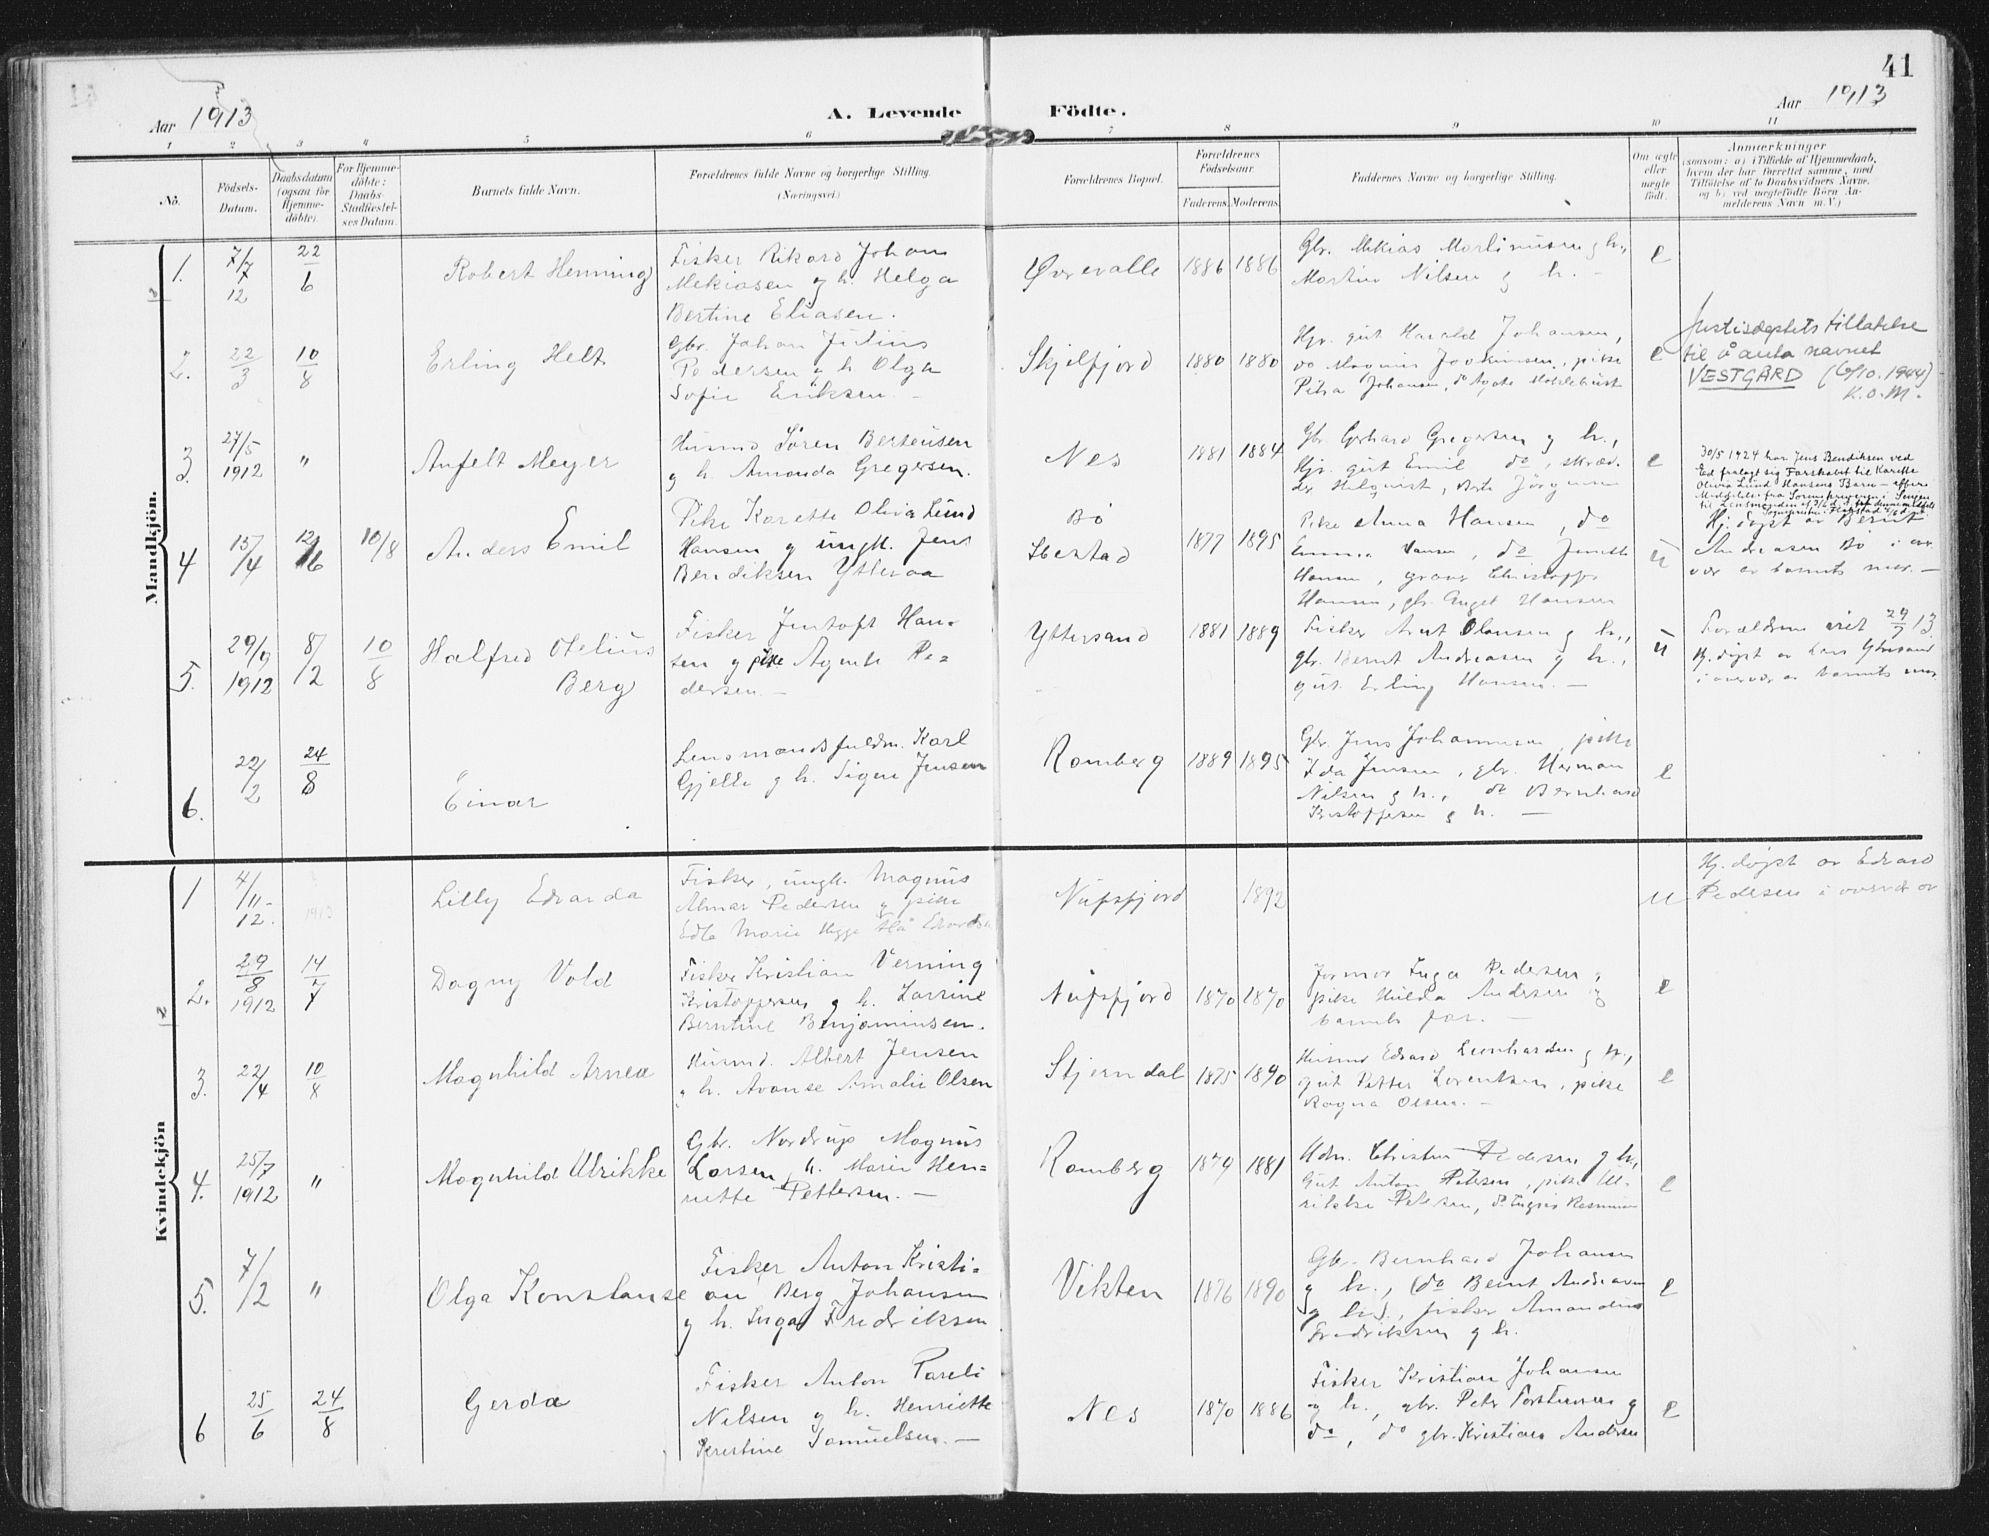 SAT, Ministerialprotokoller, klokkerbøker og fødselsregistre - Nordland, 885/L1206: Ministerialbok nr. 885A07, 1905-1915, s. 41